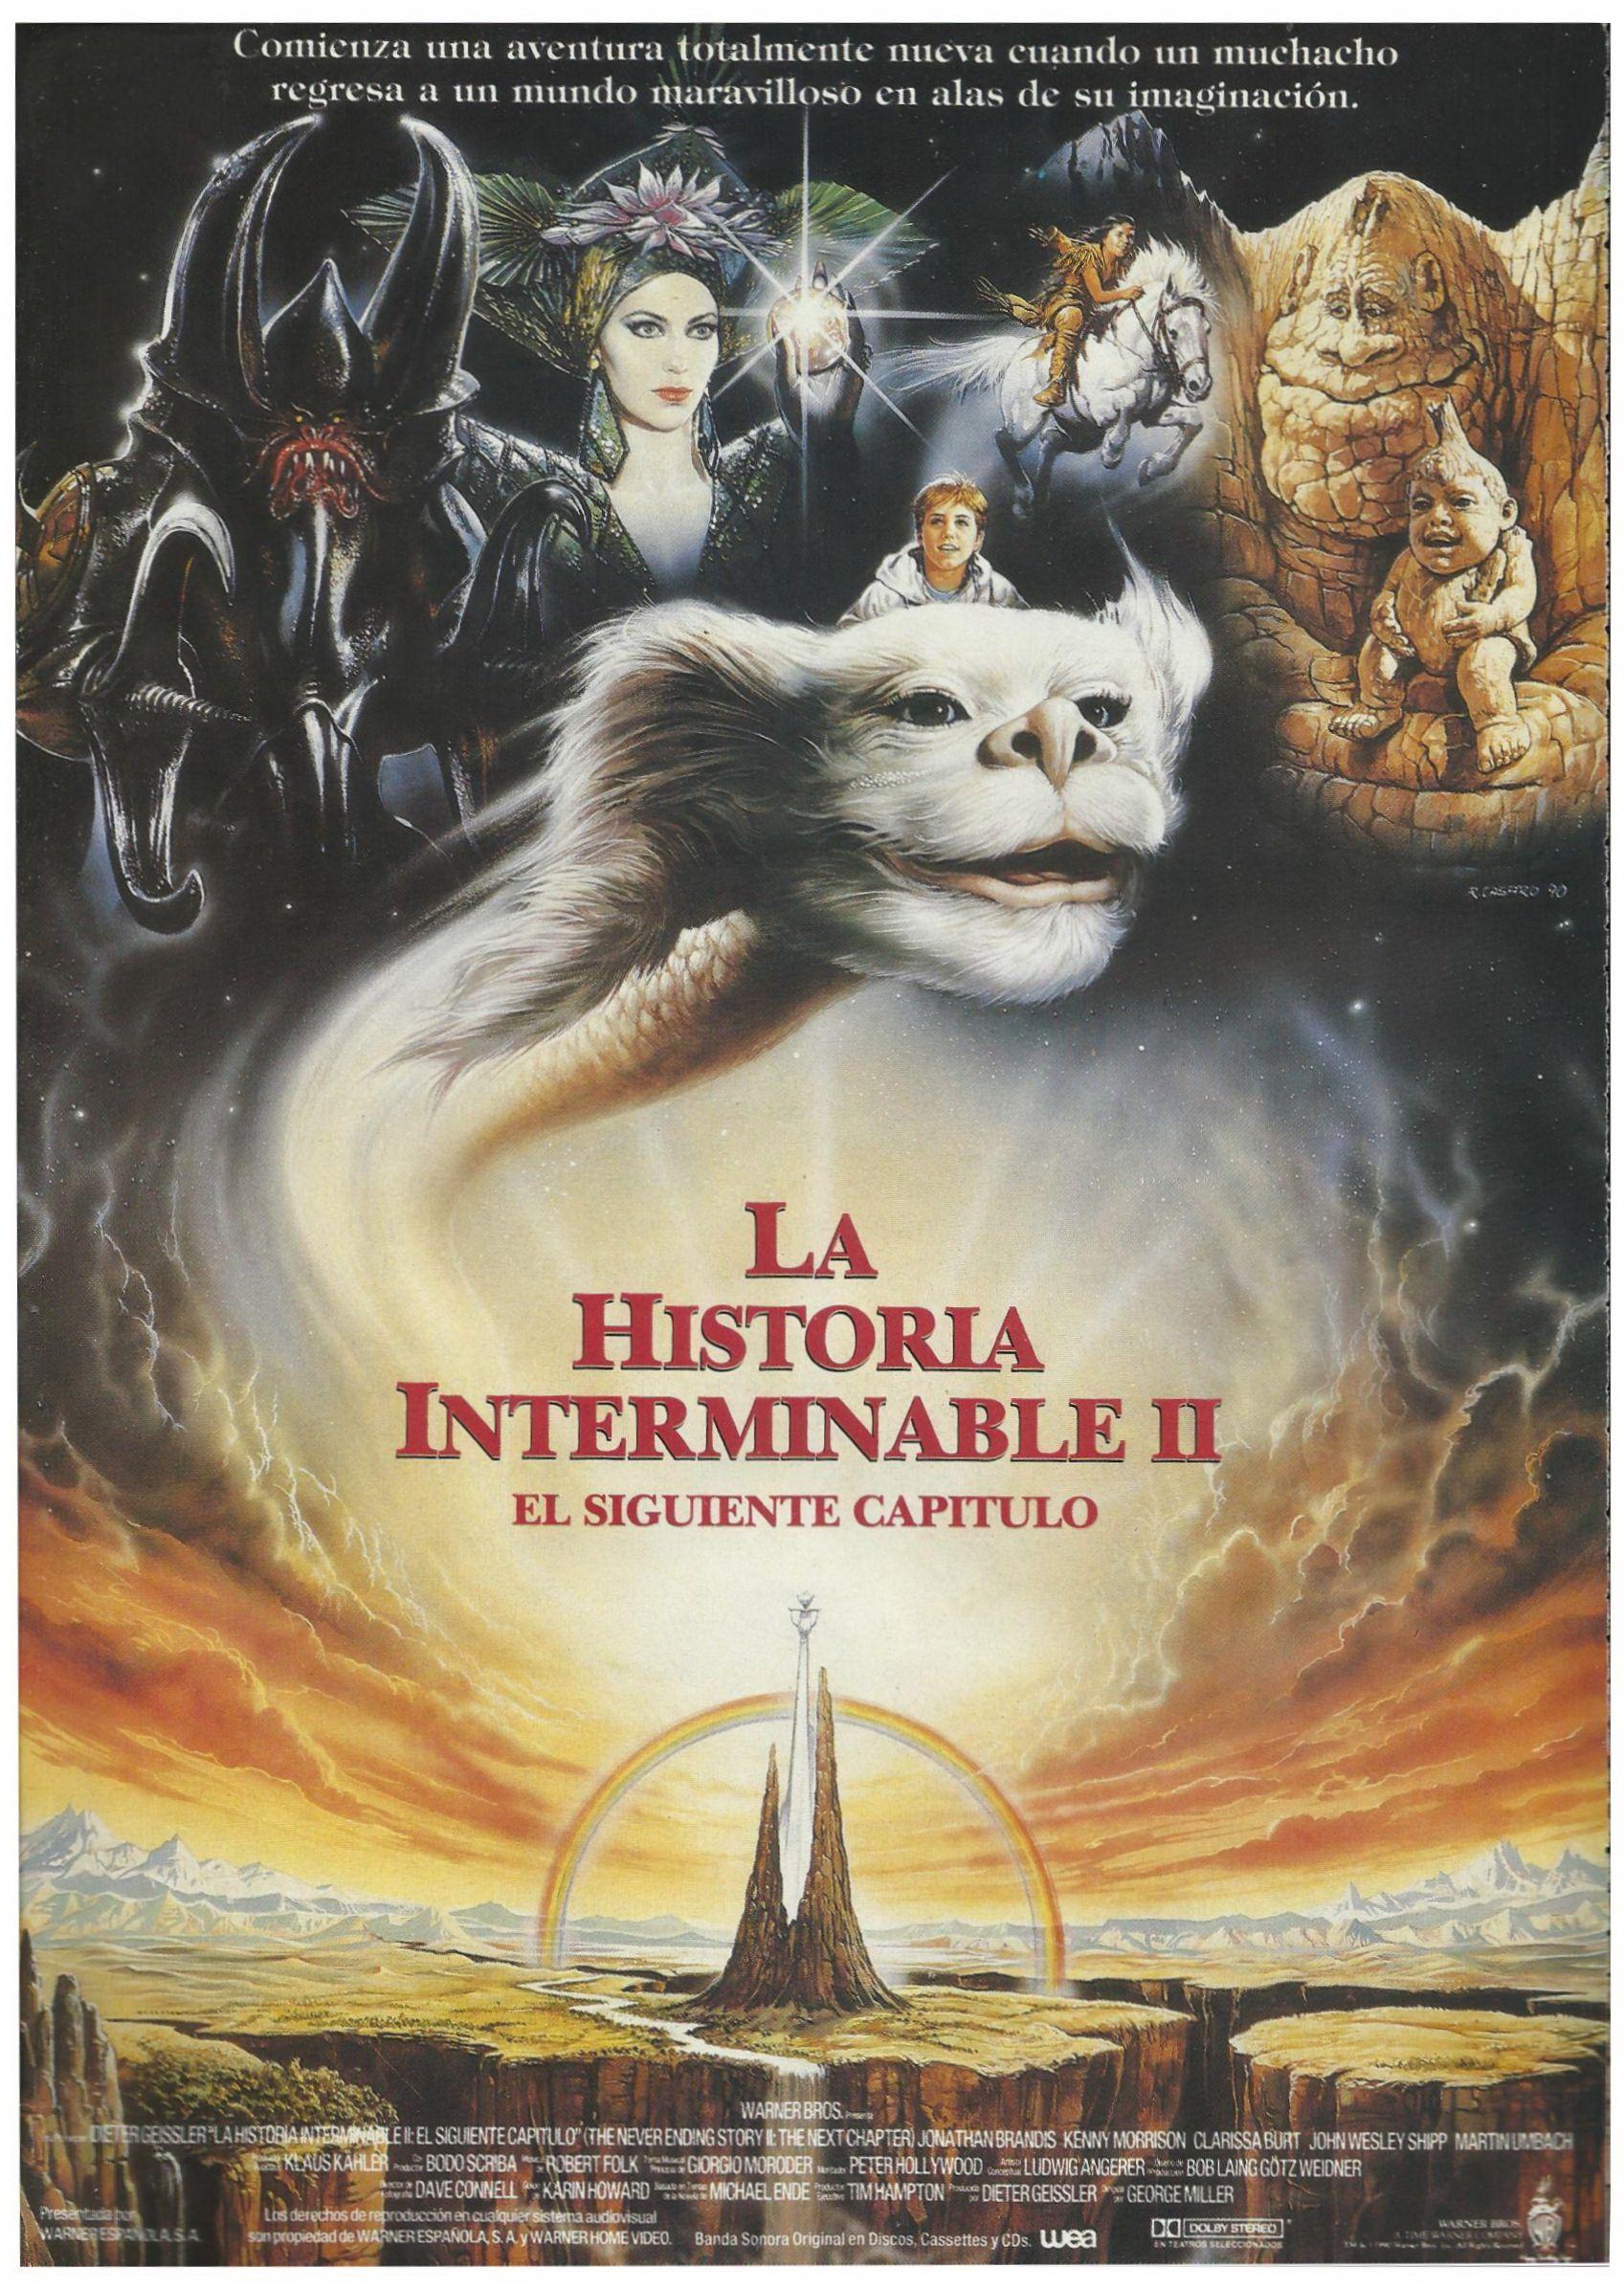 1990 La Historia Interminable Ii El Siguiente Capitulo The Neverending Story Neverending Story 2 Fantasy Movies